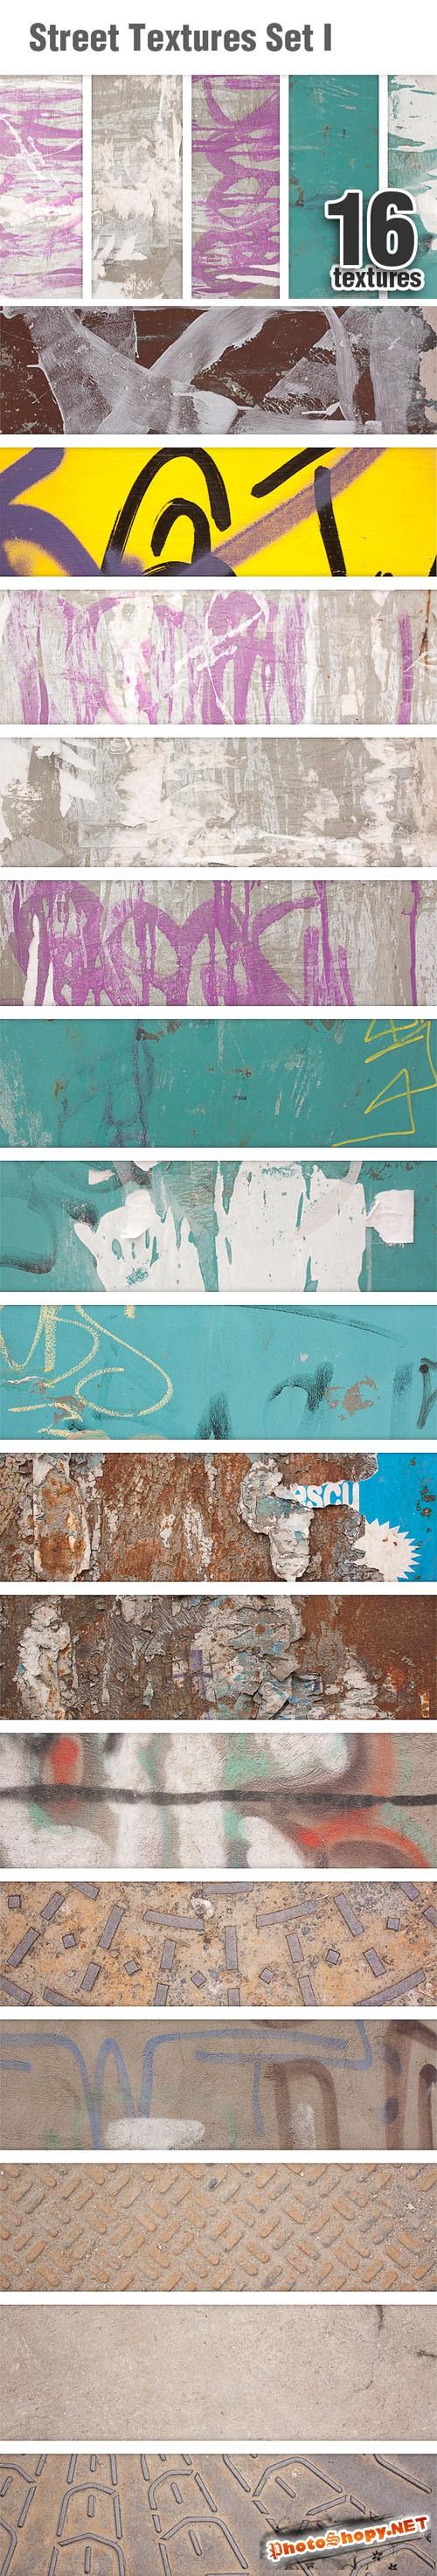 Designtnt - Street Textures Set 1